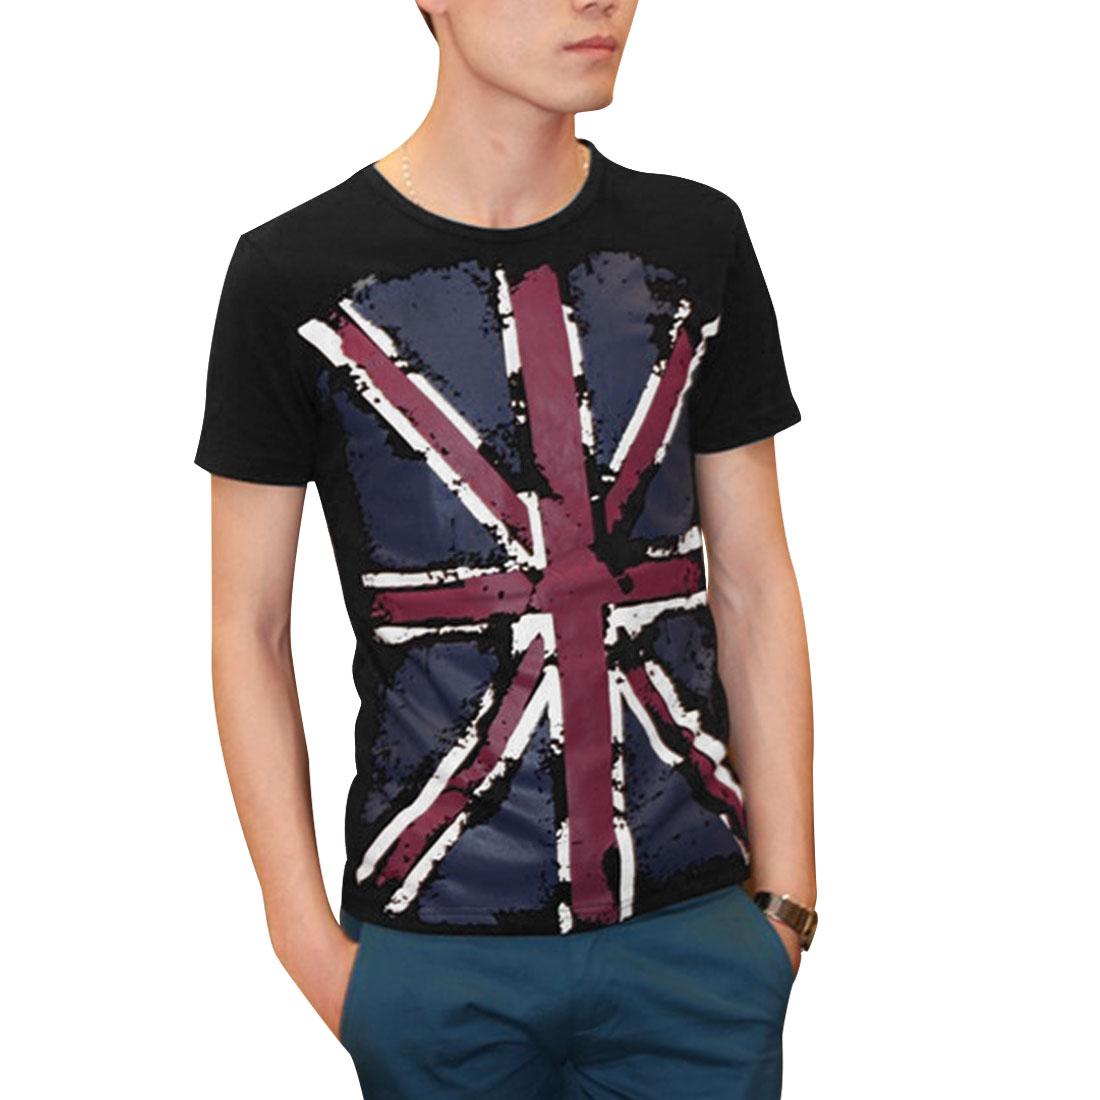 Men Short Sleeves Round Neck Pullover Summer Casual T-Shirt Black S